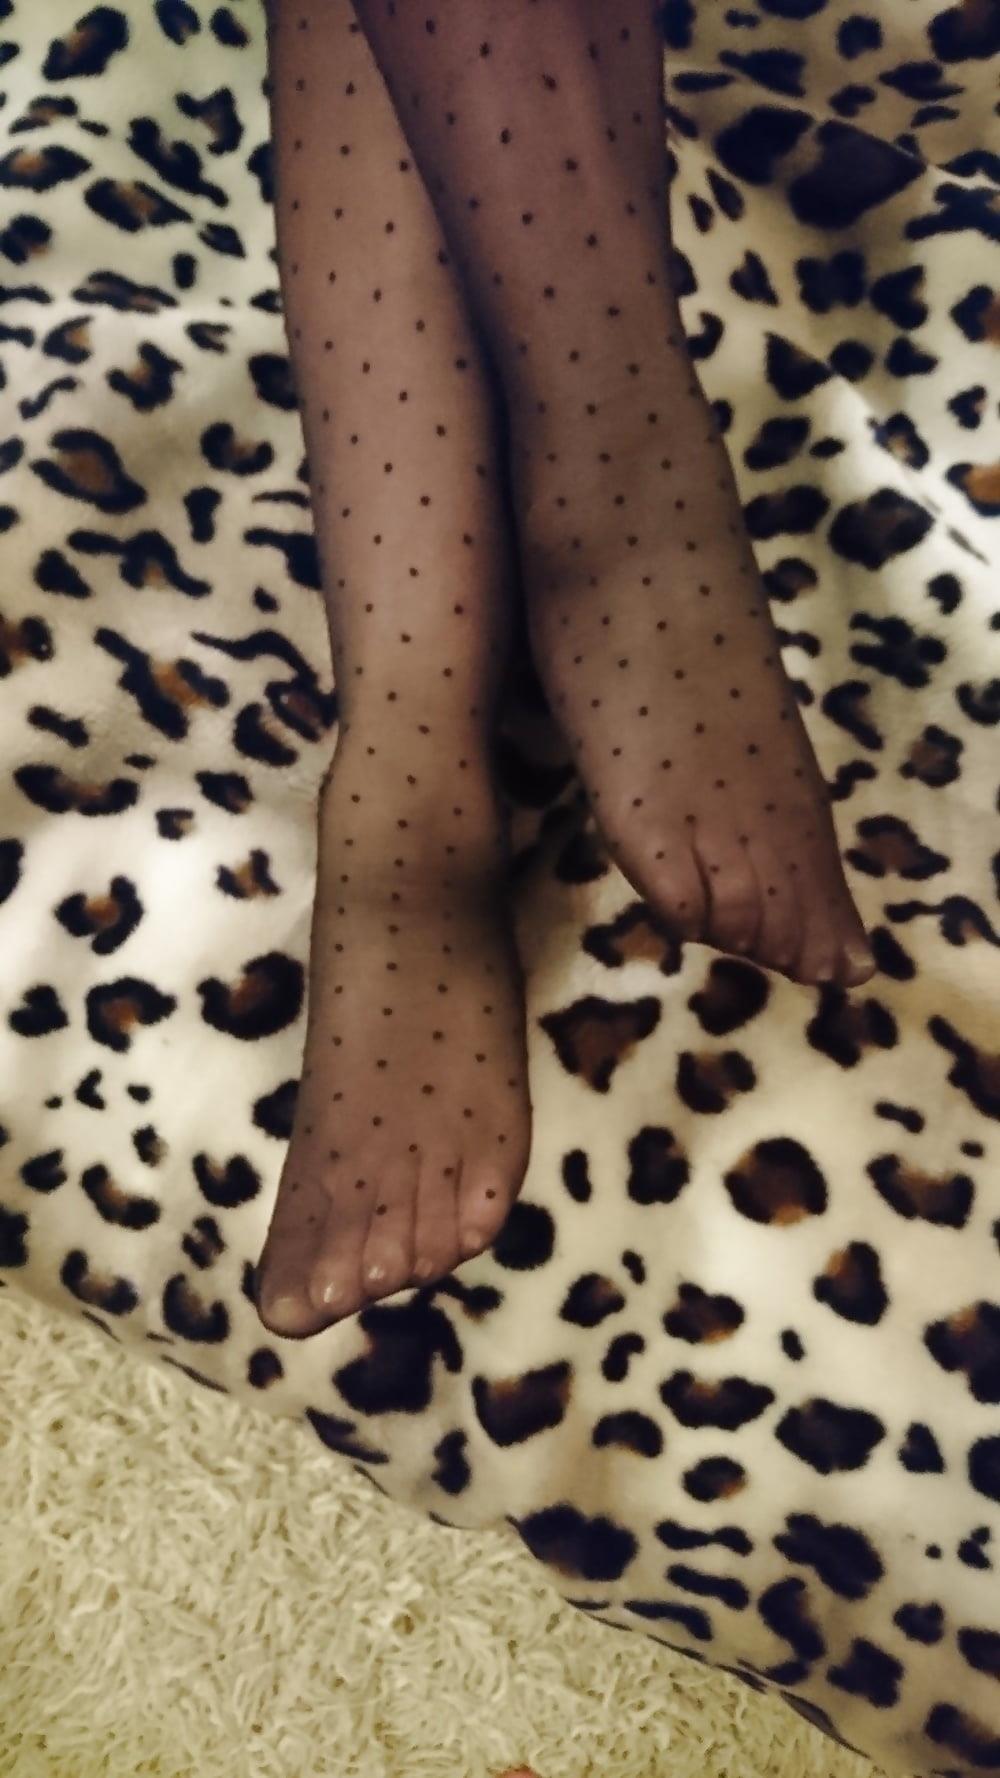 Mature sexy feet-4051